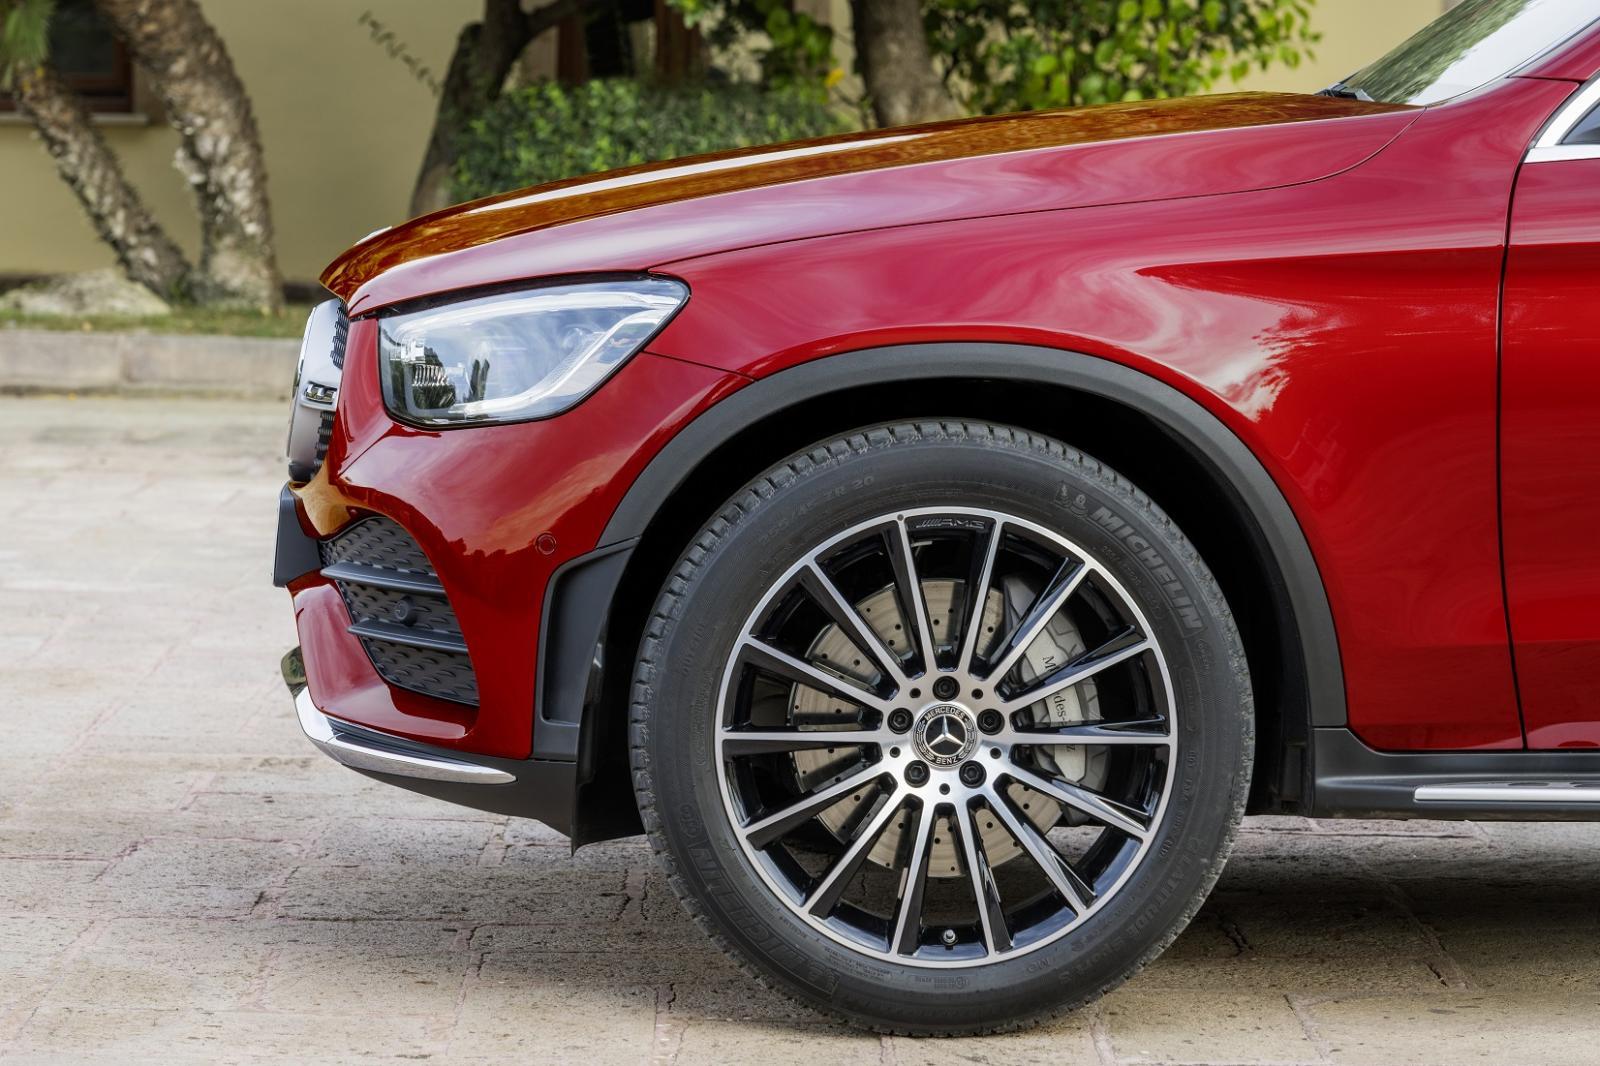 Mercedes-Benz GLC 300 4Matic Coupé 2021 resena opiniones